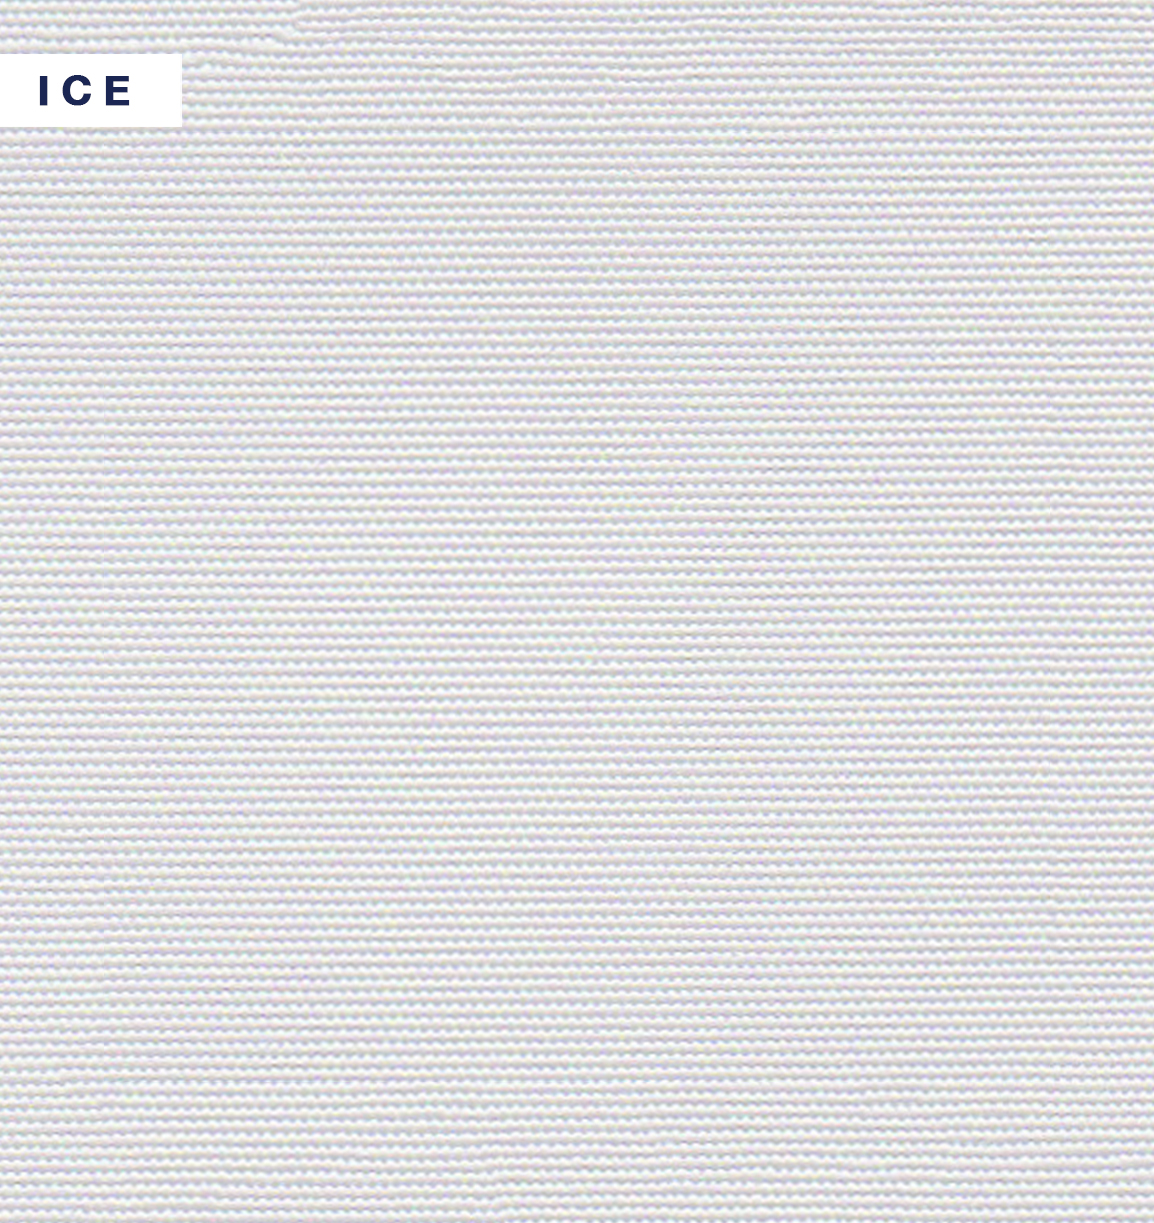 One Block - Ice.jpg